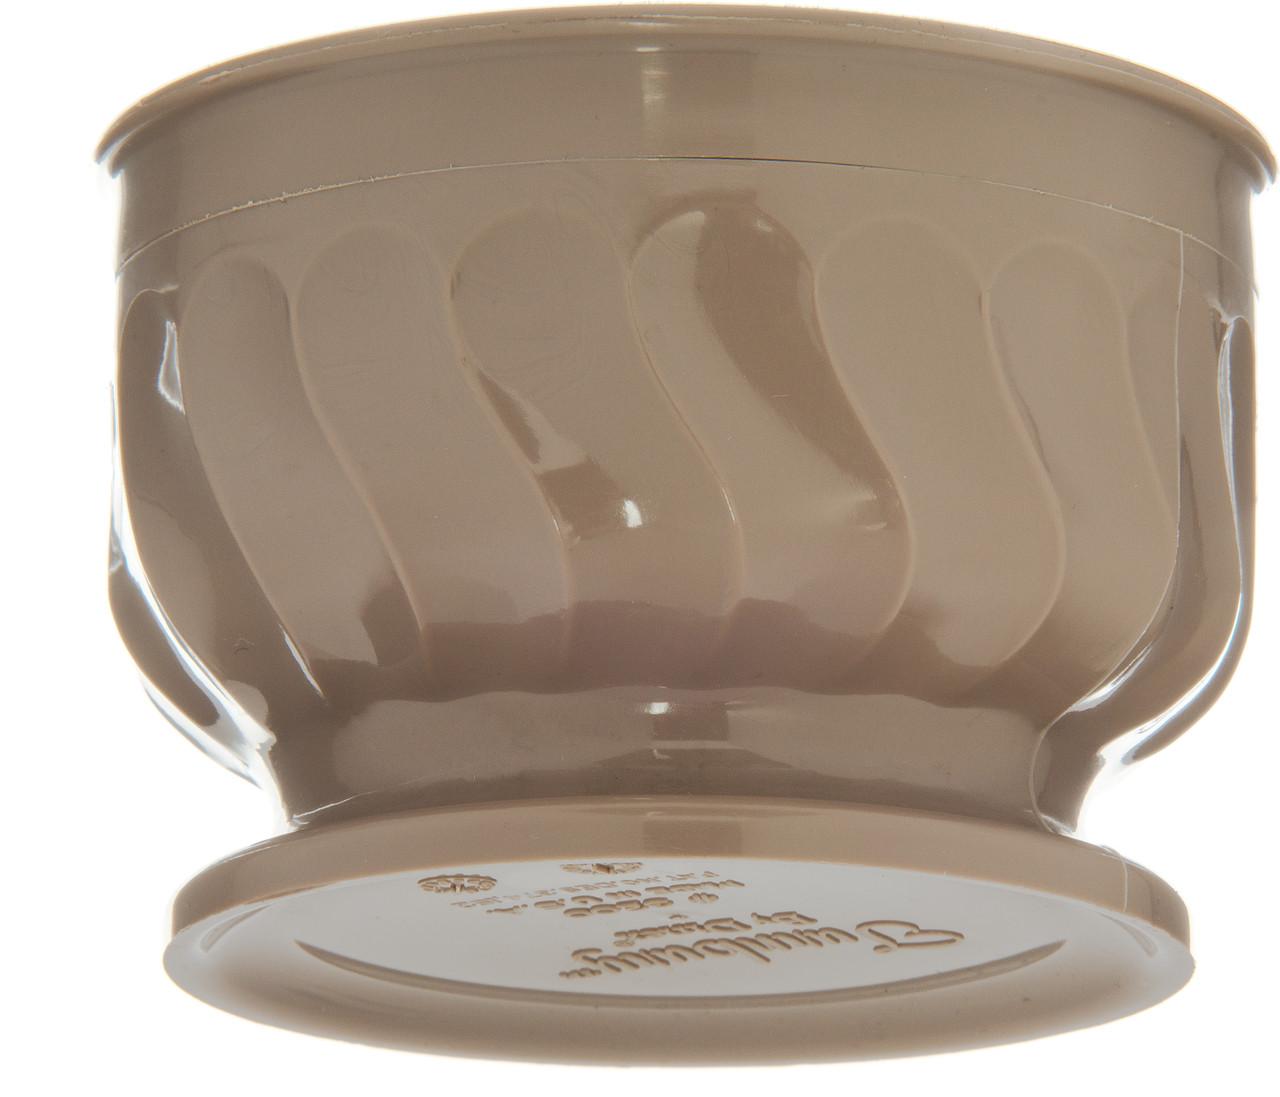 Pedestal Base Bowl, 9 oz., insulated, Turnbury®, latte (48 each per case) (3300/31)